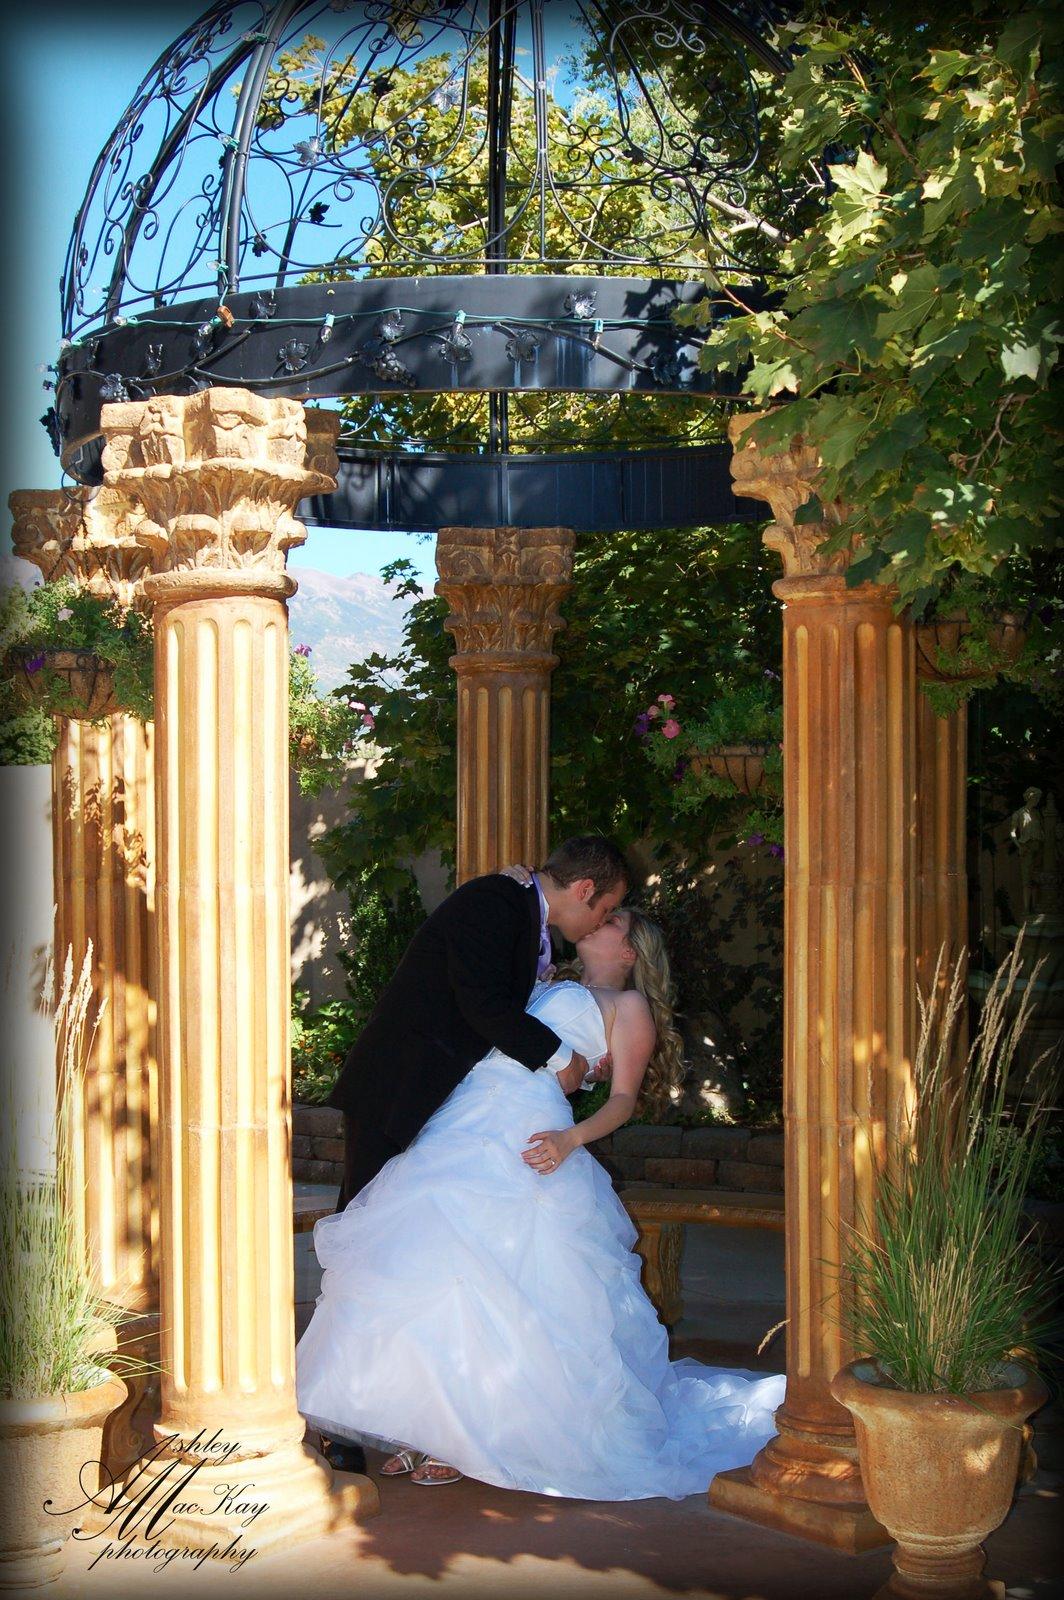 [Cassandra+&+Nicks+Wedding+392B.jpg]